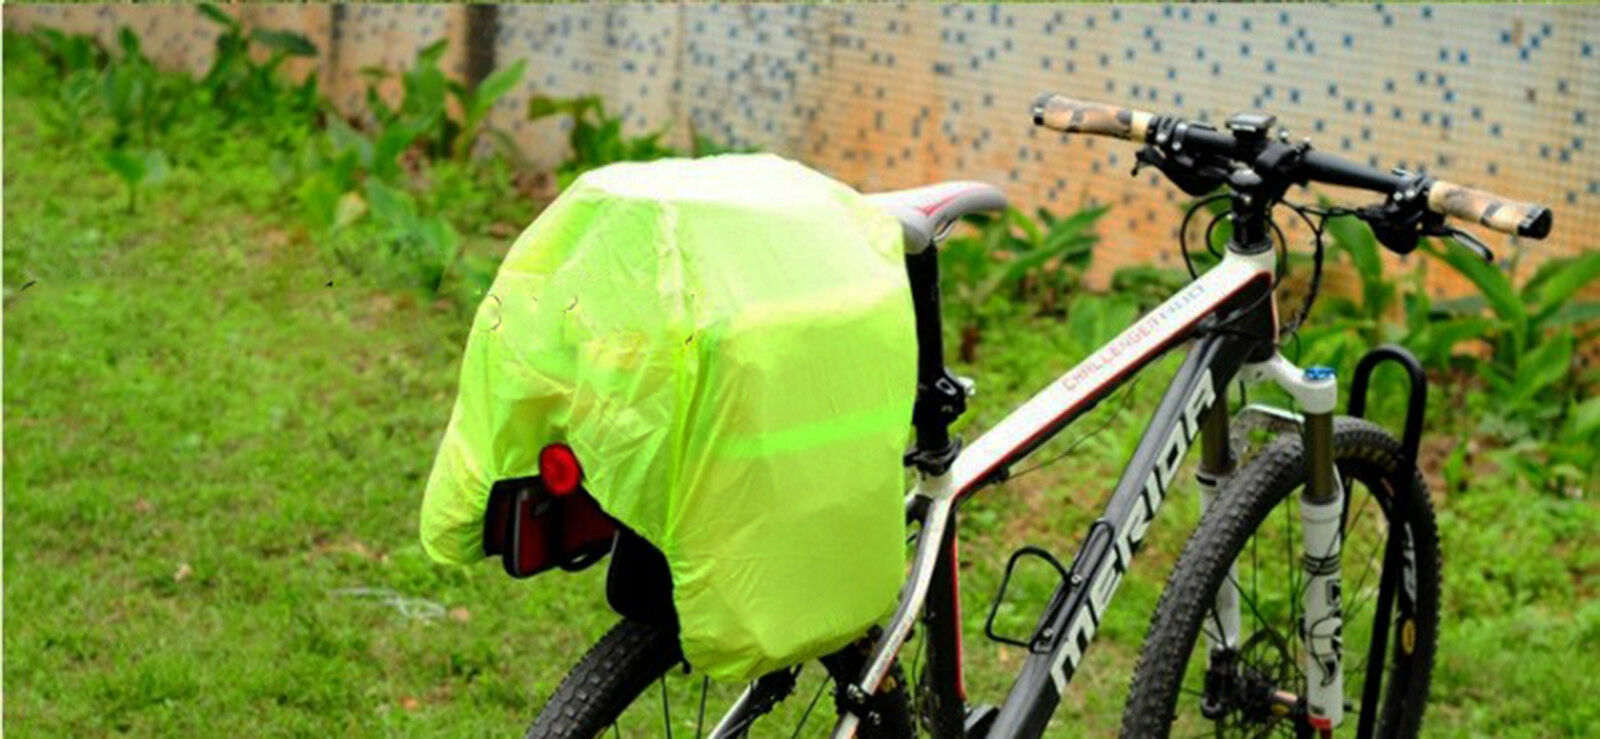 Alforjas Triple Triple Triple Desmontable Impermeable Bicicleta + Funda Alta Visibilidad 3592 53a8bf